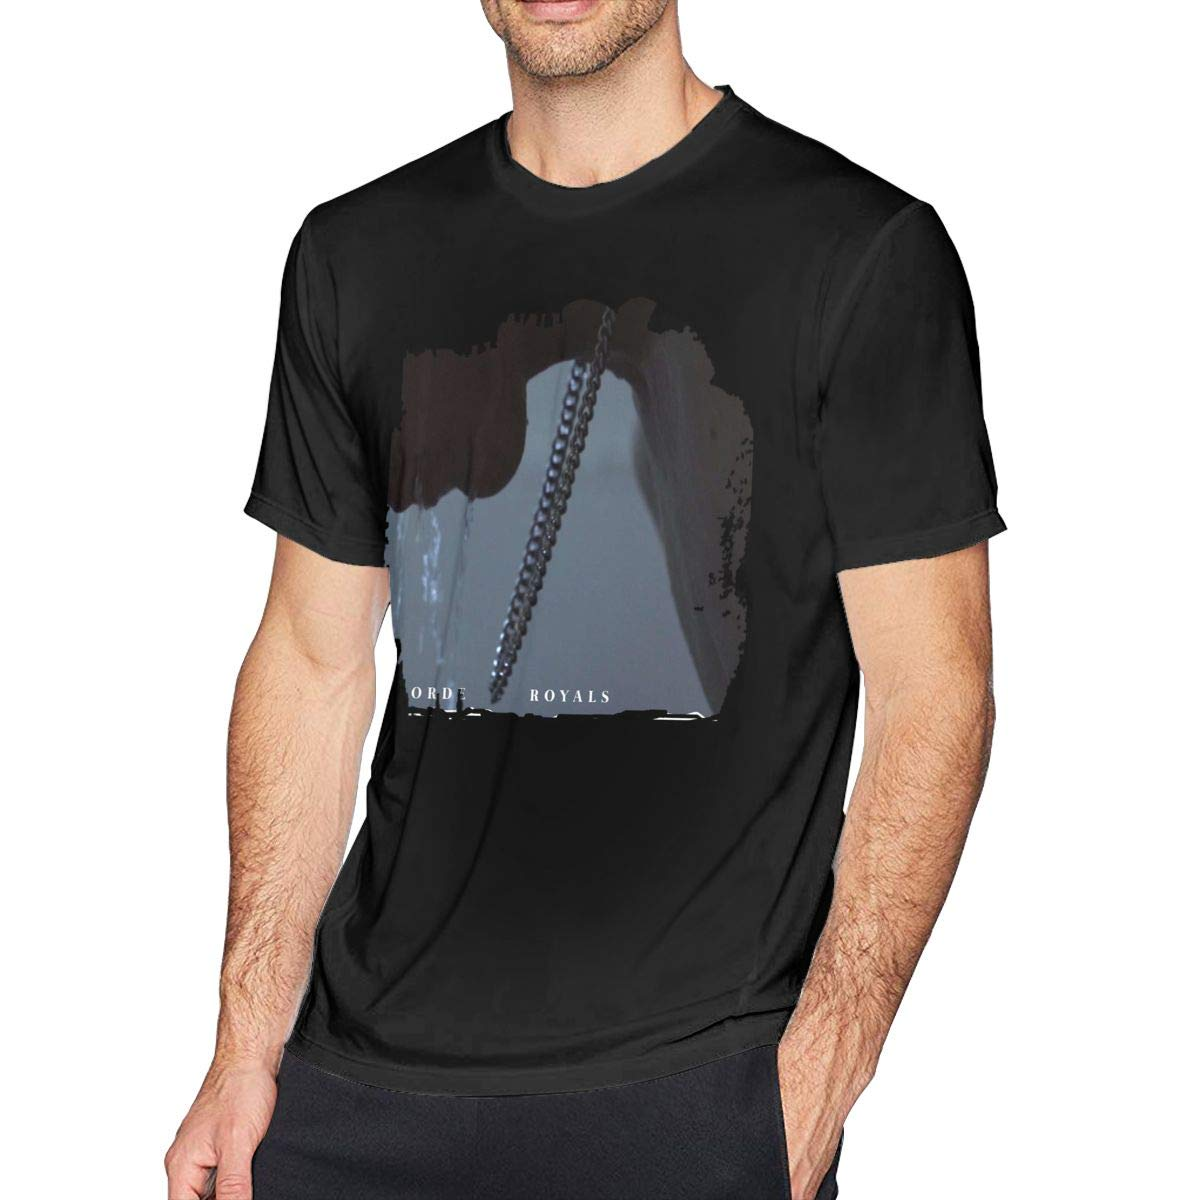 Royals S Classic Tshirt Black